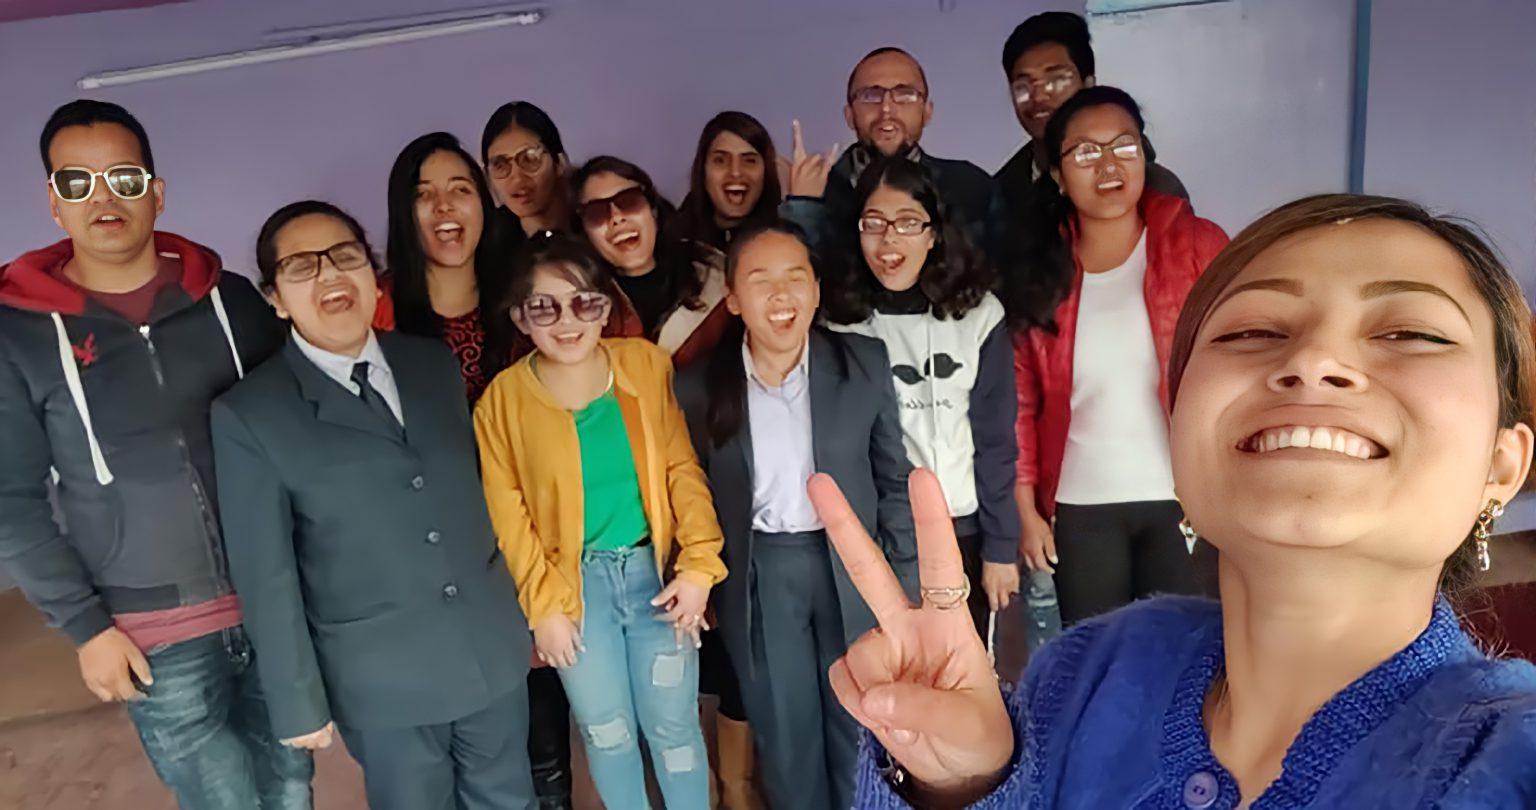 Blind Rocks! staff Divya Shah capturing selfie with beneficiaries and Sristi cheering behind Divya